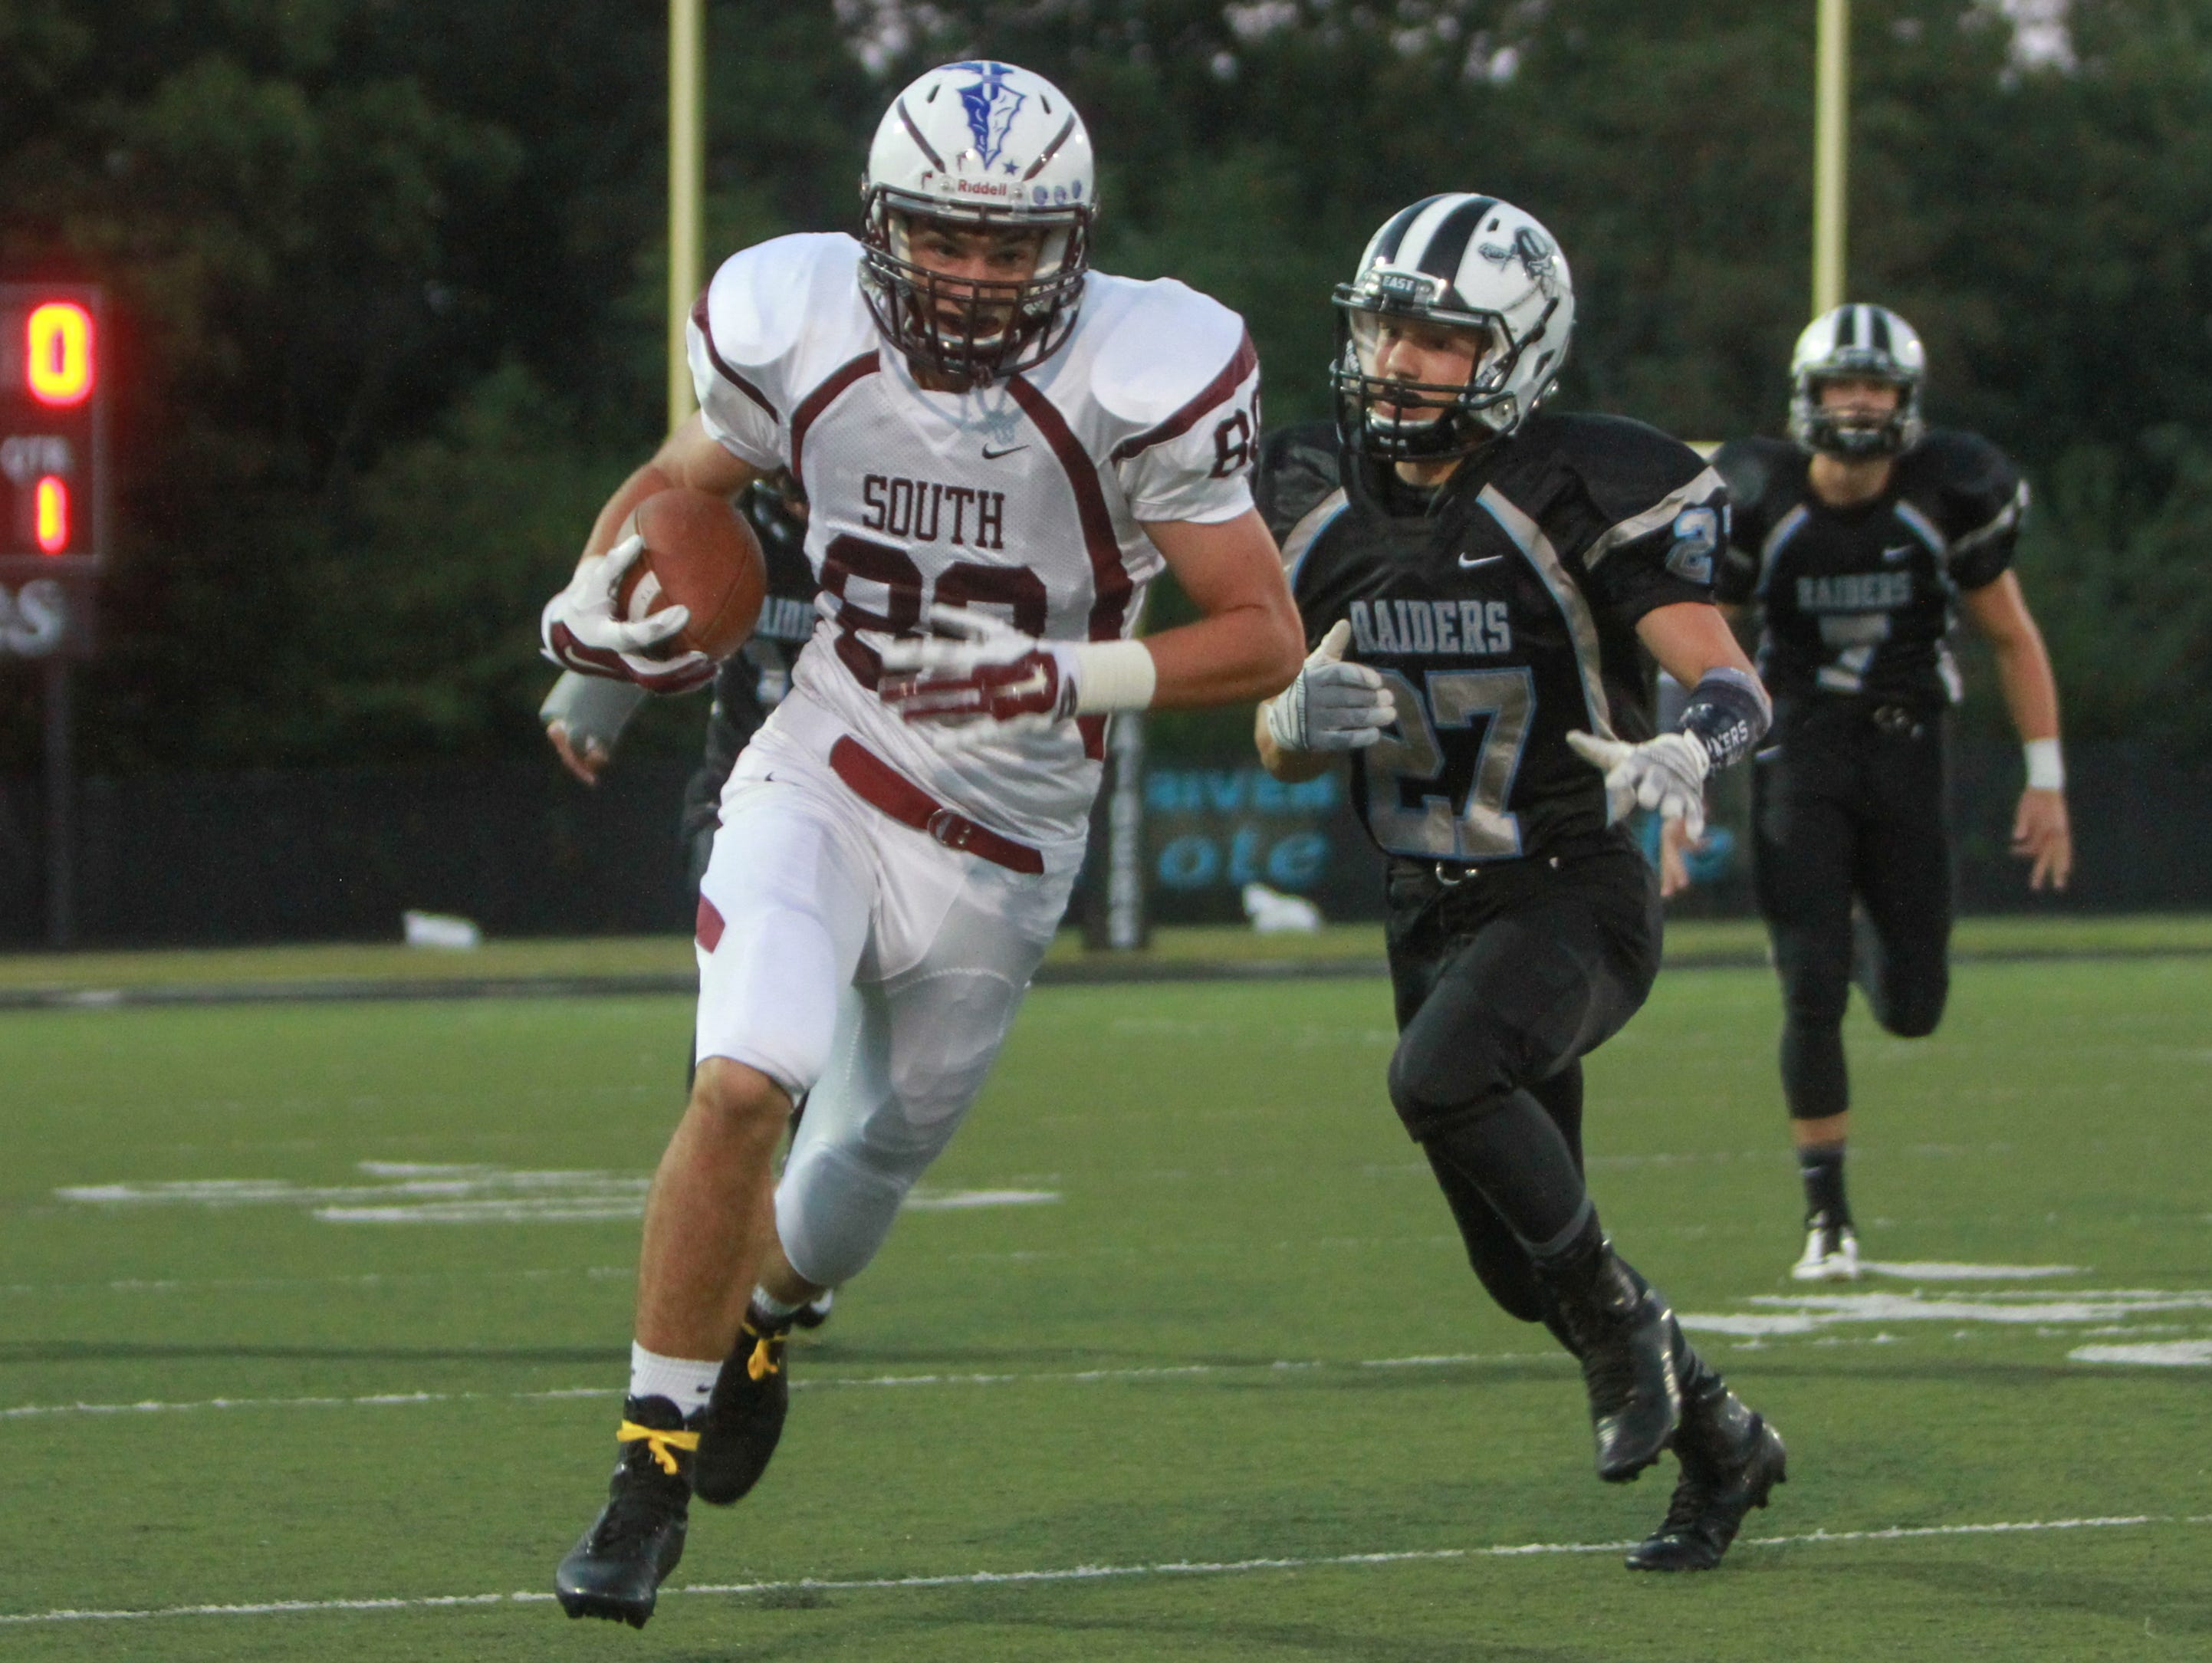 Toms River, NJ TRS #80 Russell Dahlgren vs. TRE #27 Tyler Machnik in the first quarter. Toms River High South at Toms River High School East. 091815 - 3252147